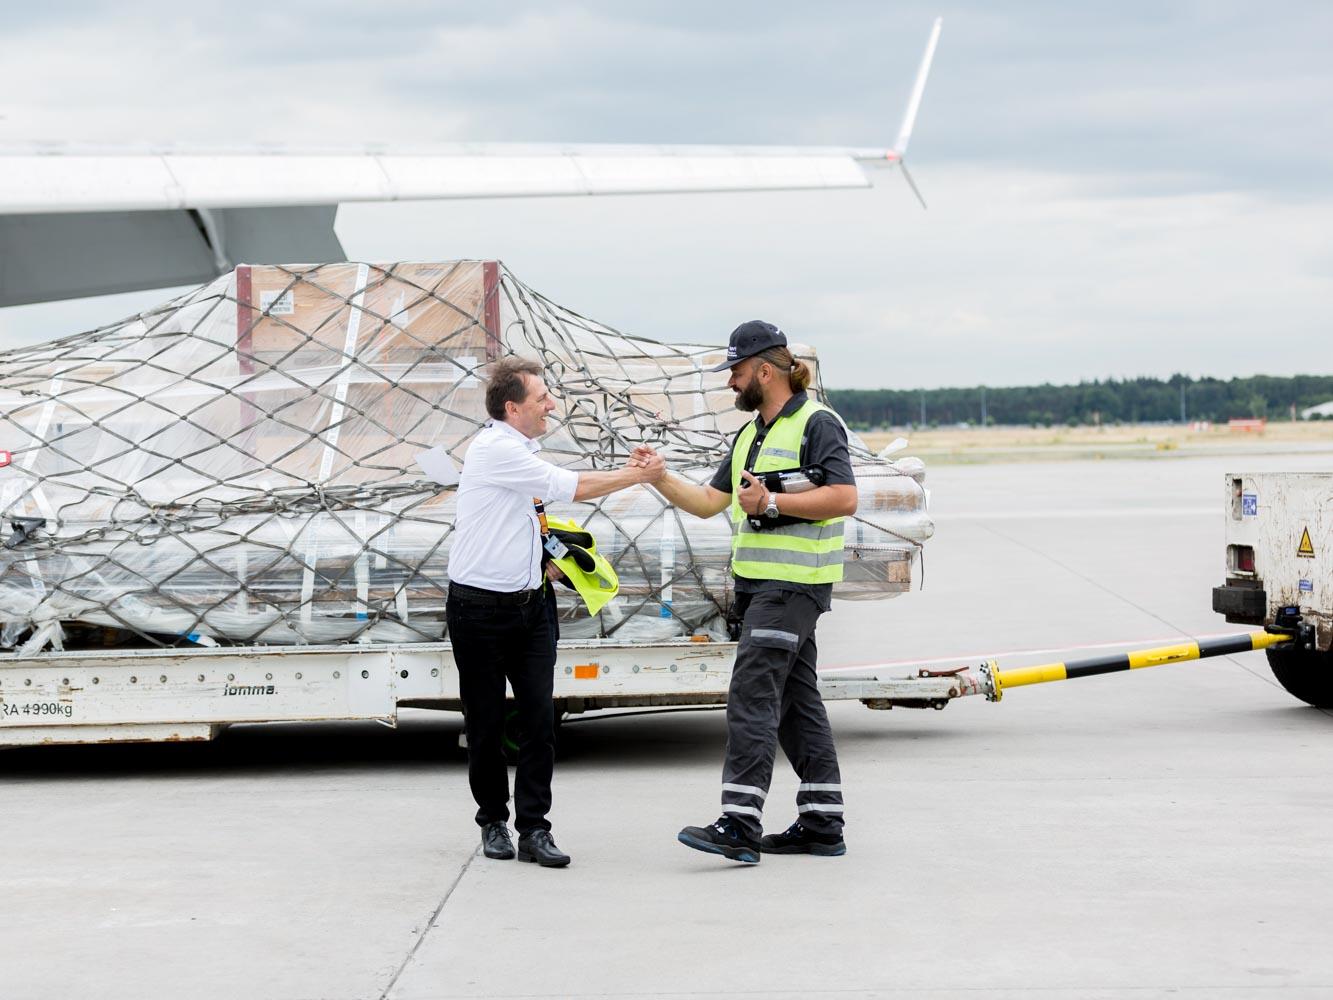 reportage_daniel_kummer-lufthansa_cargo_dahw_2018-07